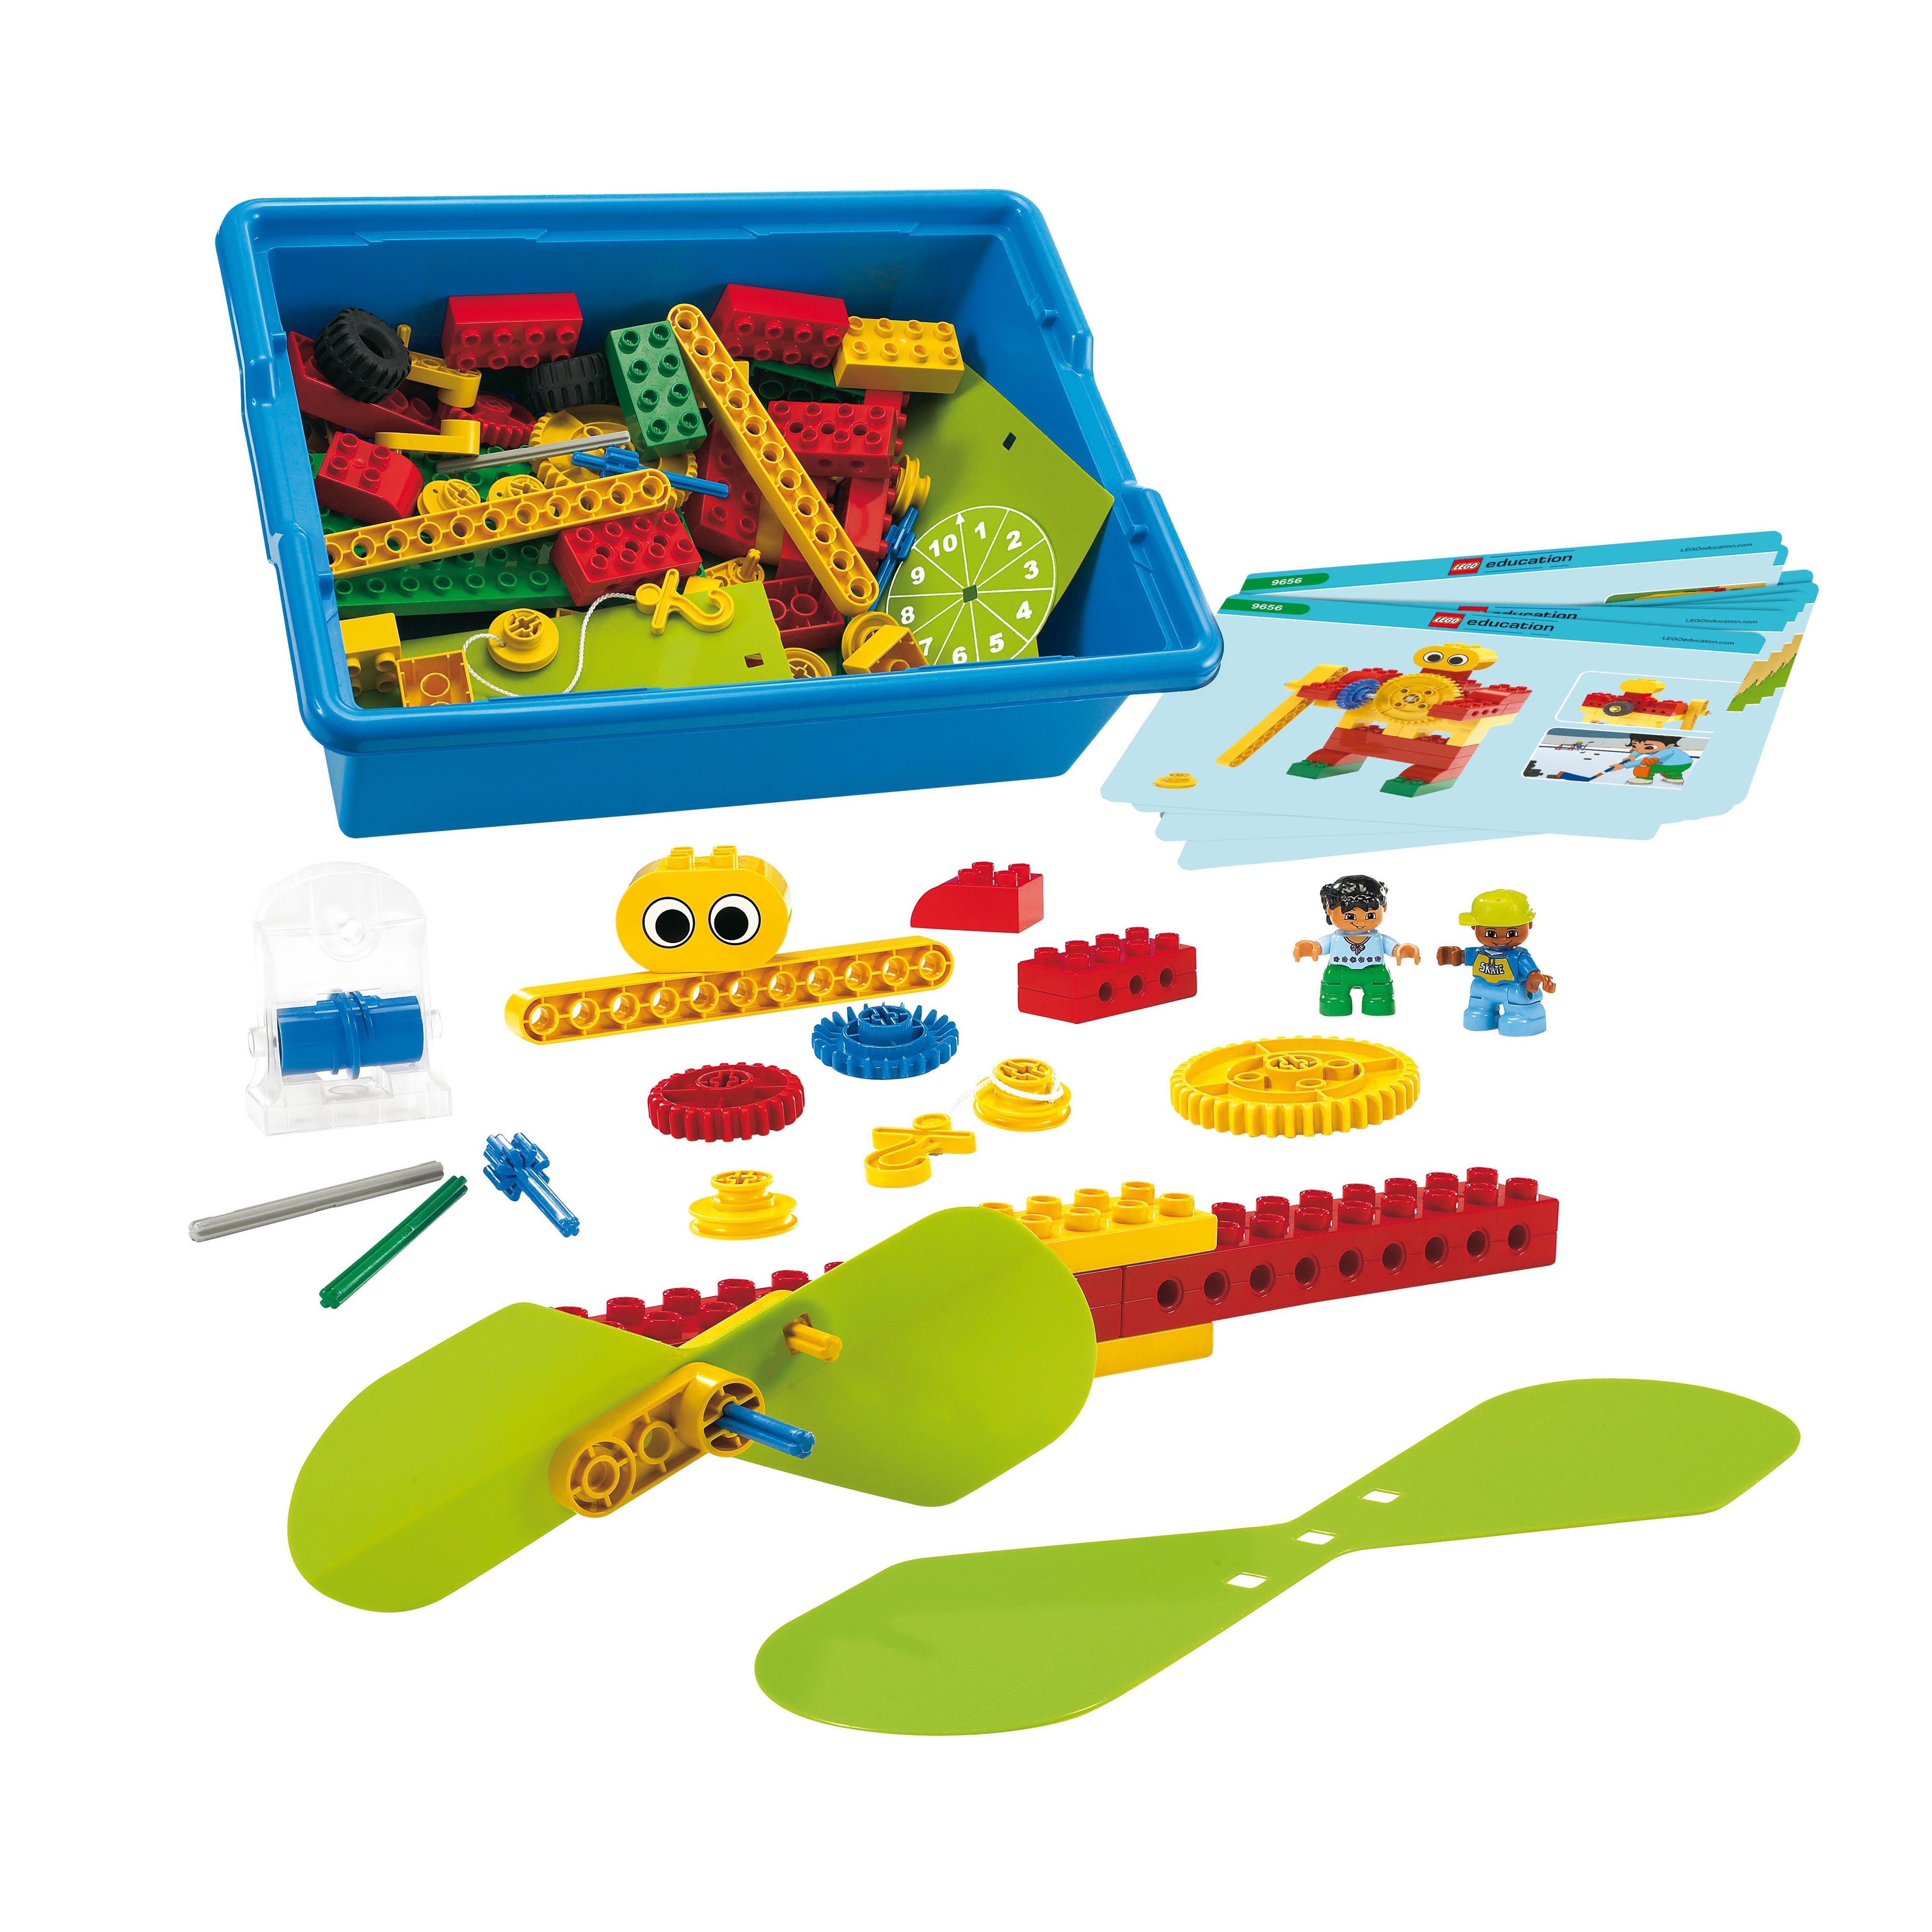 Early simple machines 9656 | LEGO DUPLO Heutink voor Thuis